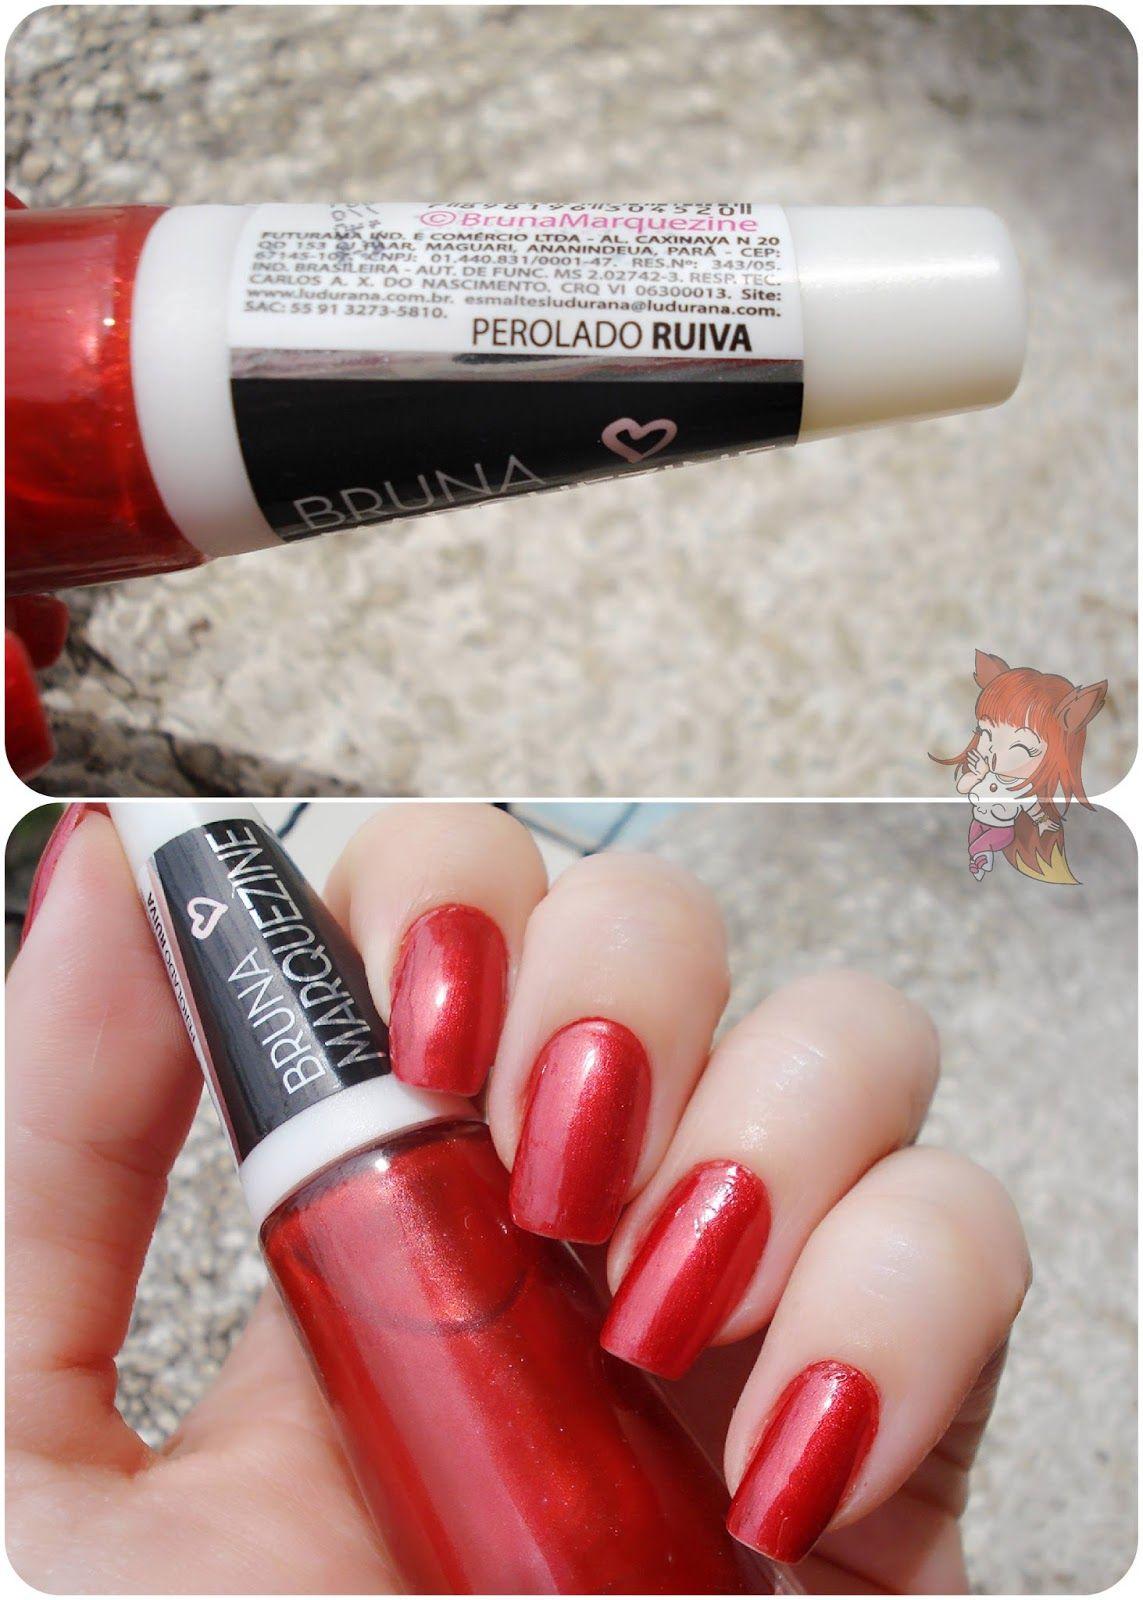 Esmalte Ludurana Vermelho Metálico :: Ruiva  http://www.ruivacohen.com.br/2015/12/esmalte-ludurana-vermelho-metalico-ruiva.html